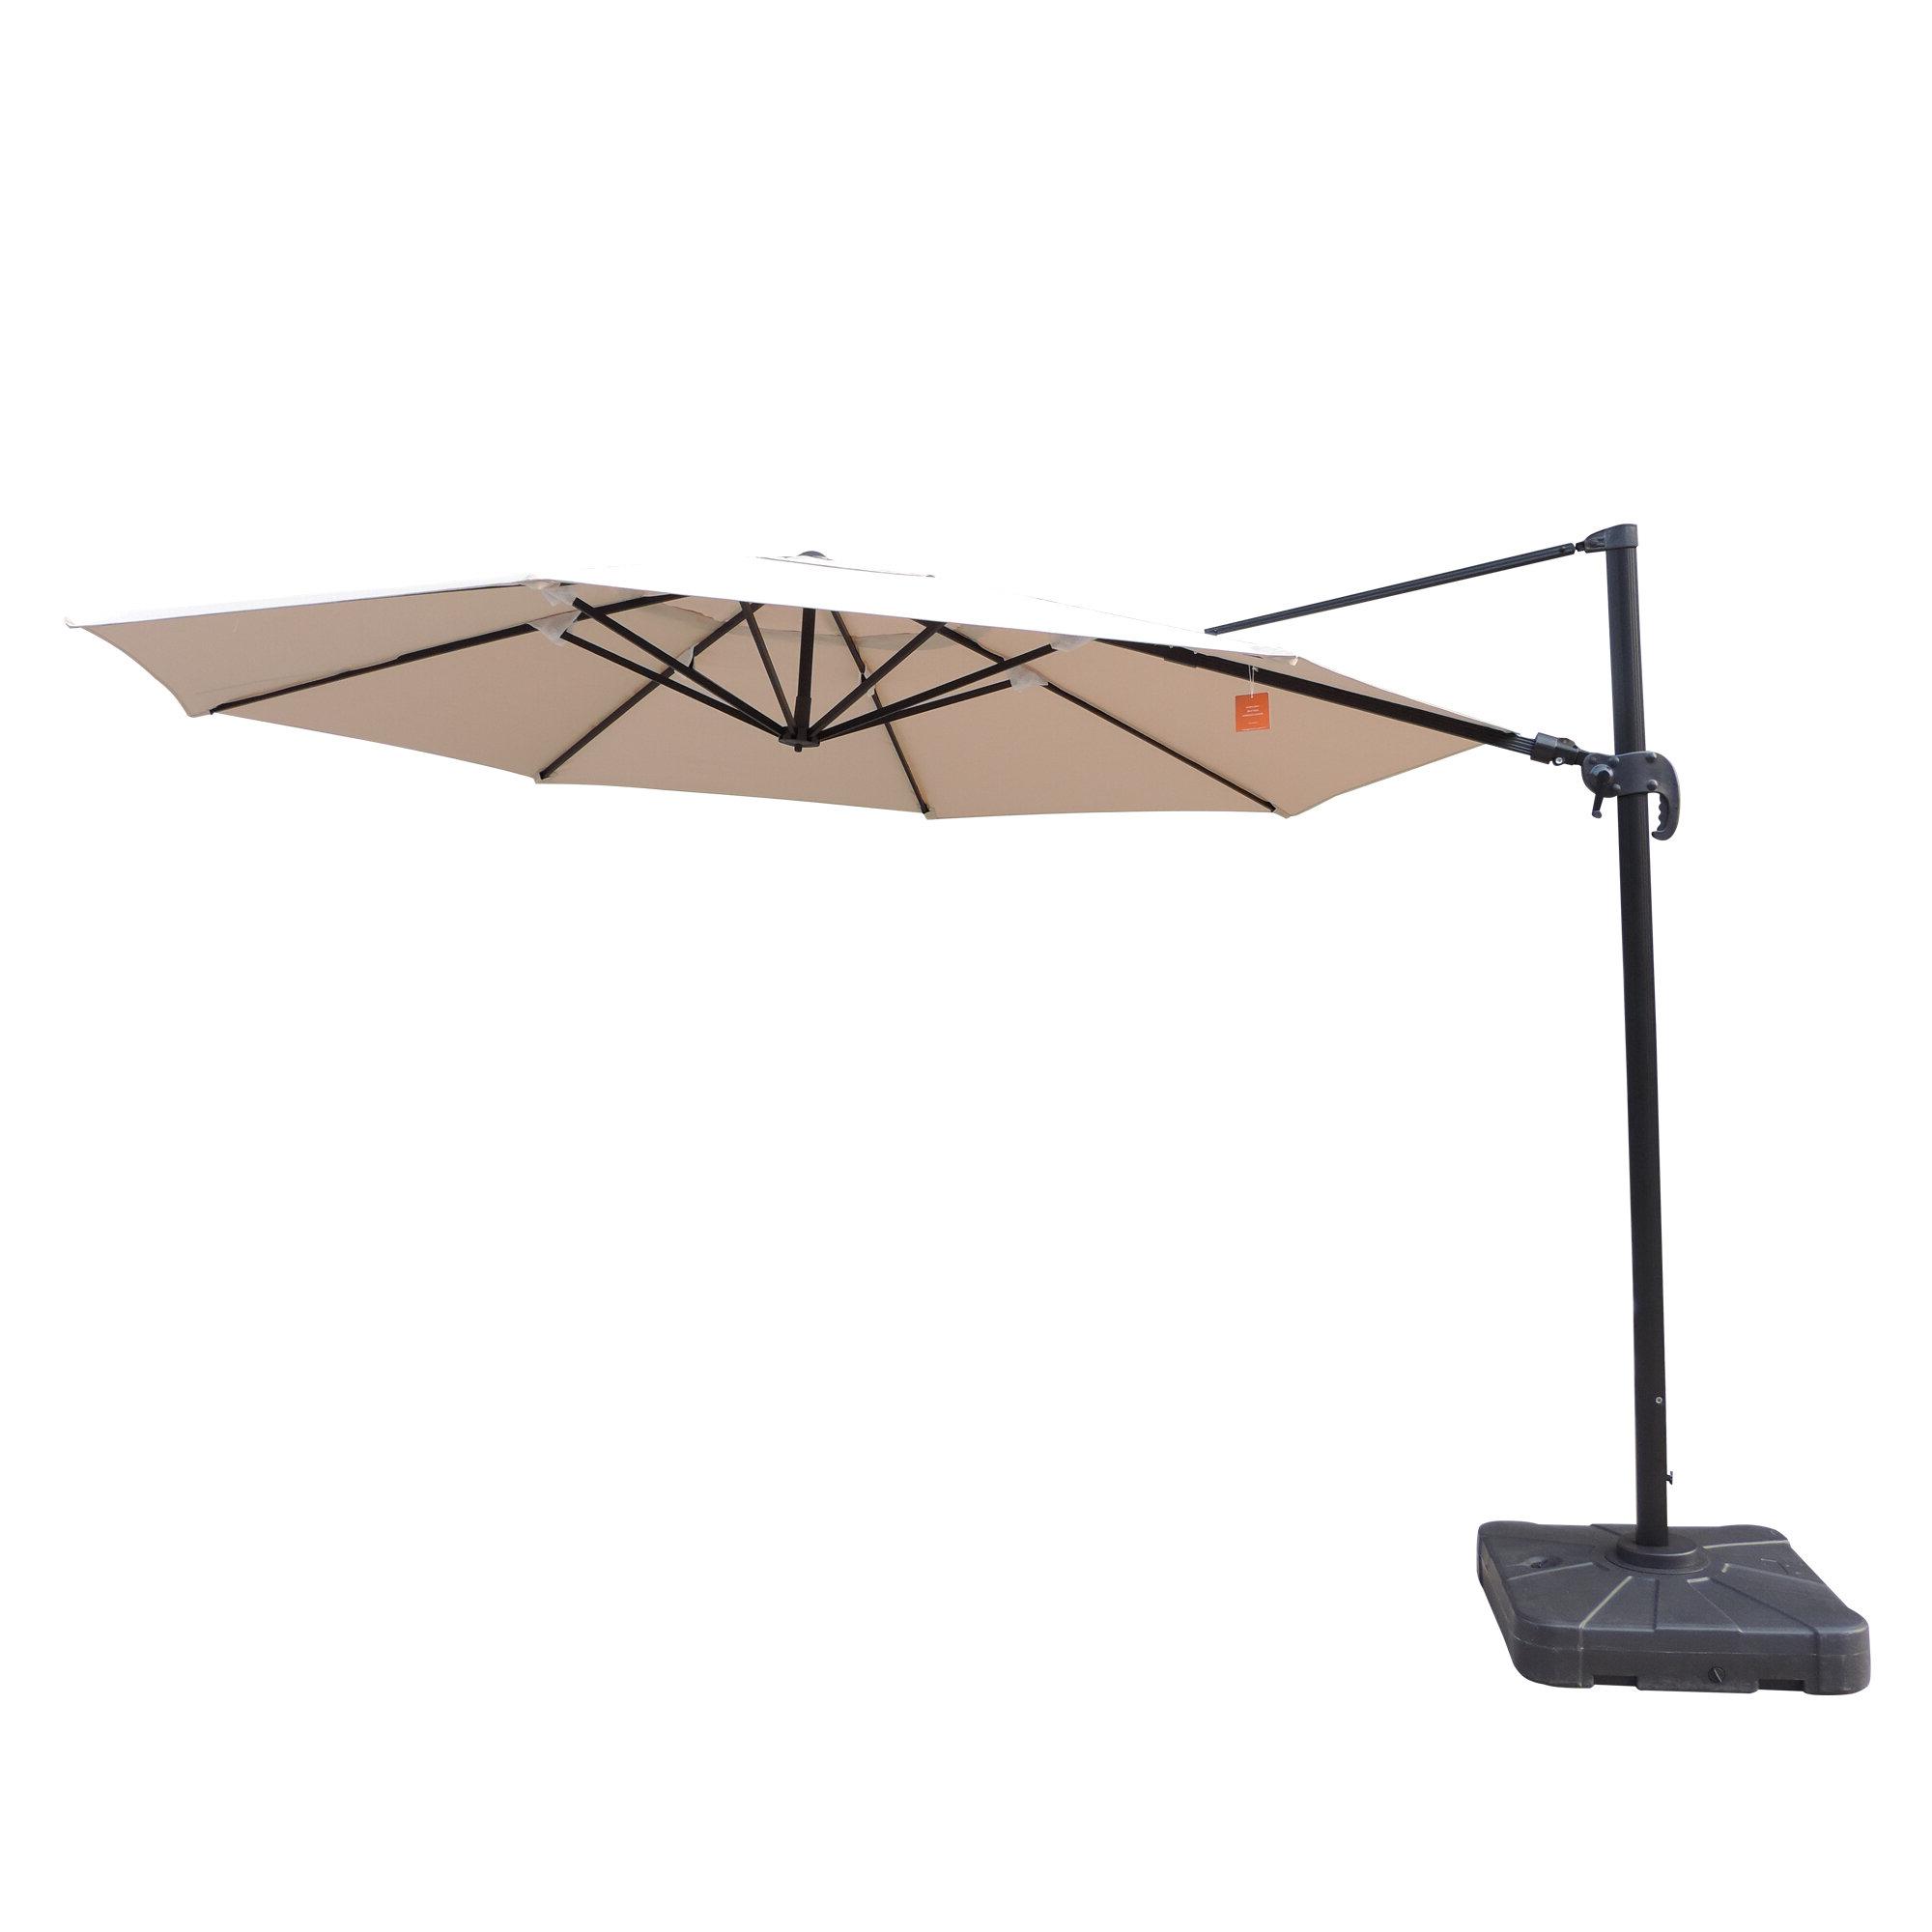 Lennie Cantilever Sunbrella Umbrellas In Popular Canora Grey Lennie 13' Cantilever Sunbrella Umbrella (View 2 of 20)